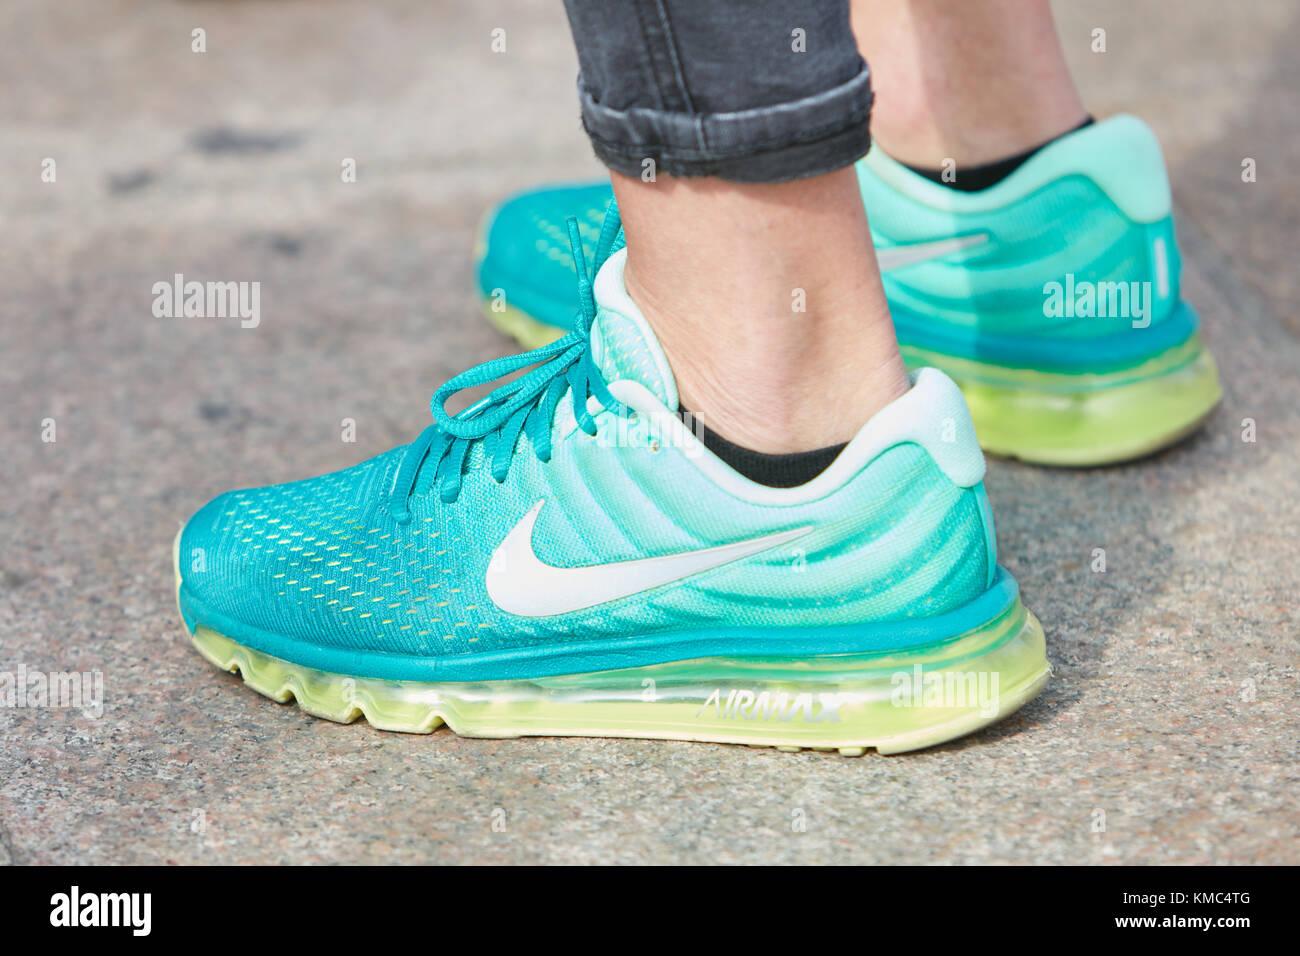 Mailand Türkis 23SeptemberMann Schuhe mit Nike airmax rBoxedC